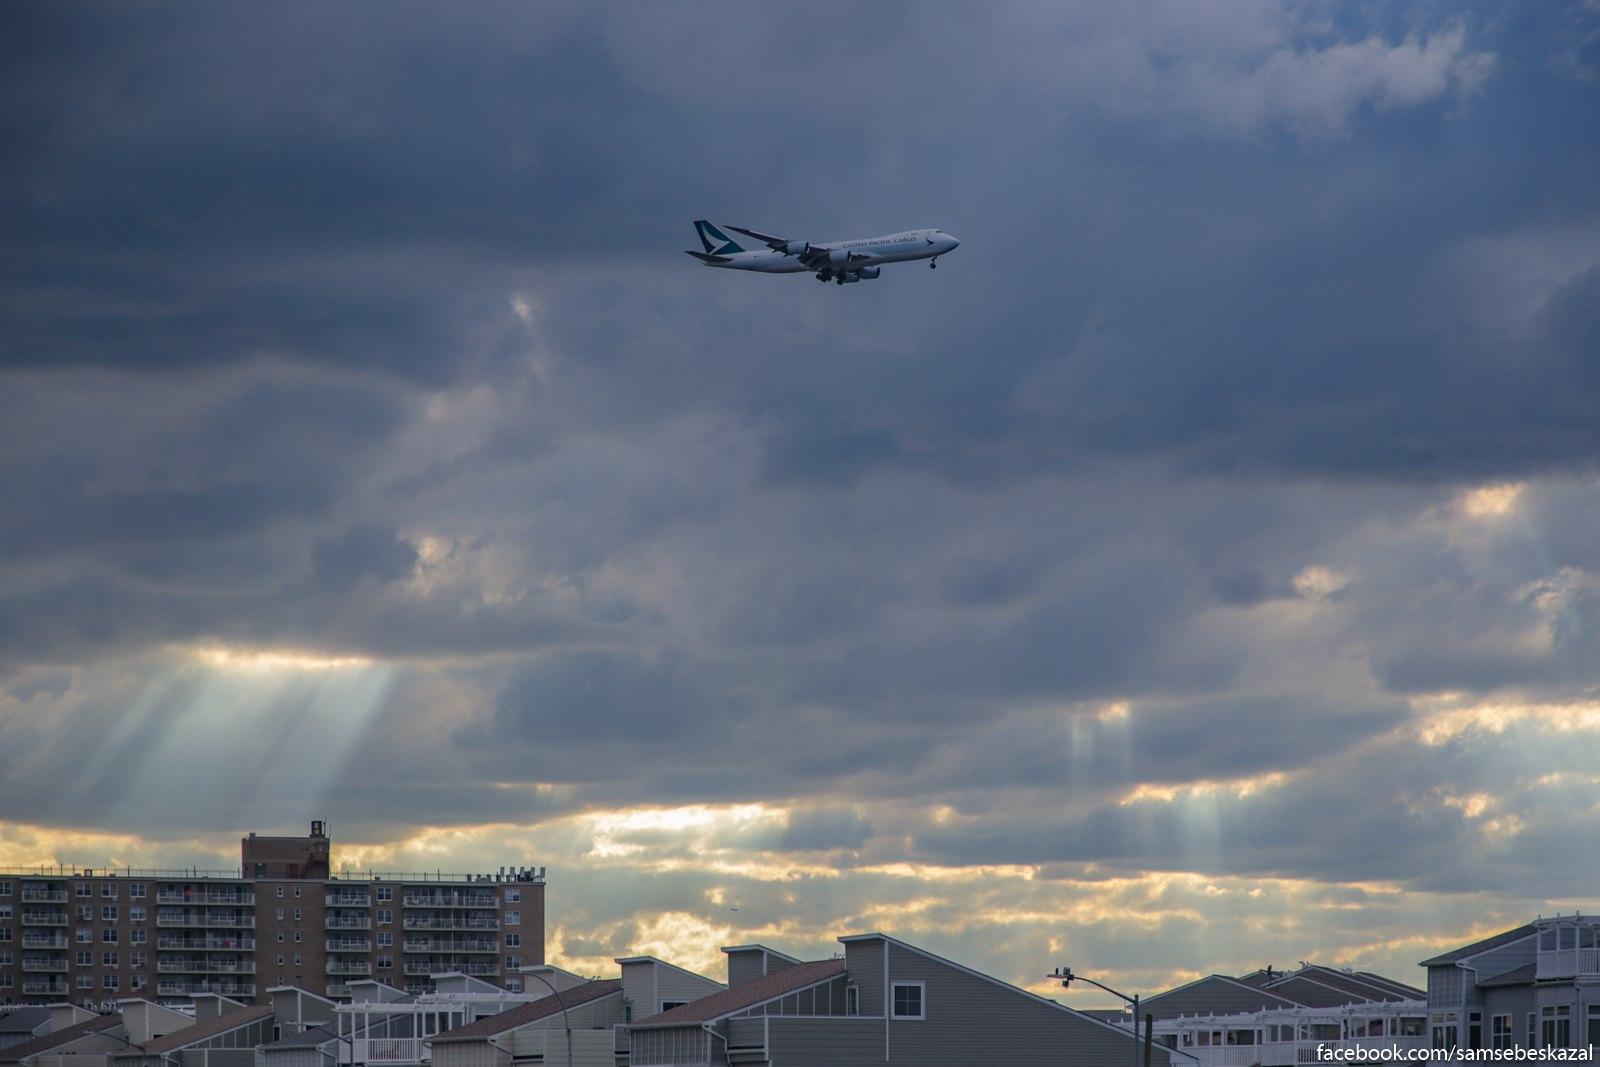 Boing 747 idusij na posadku. Rokavej, Kuins.